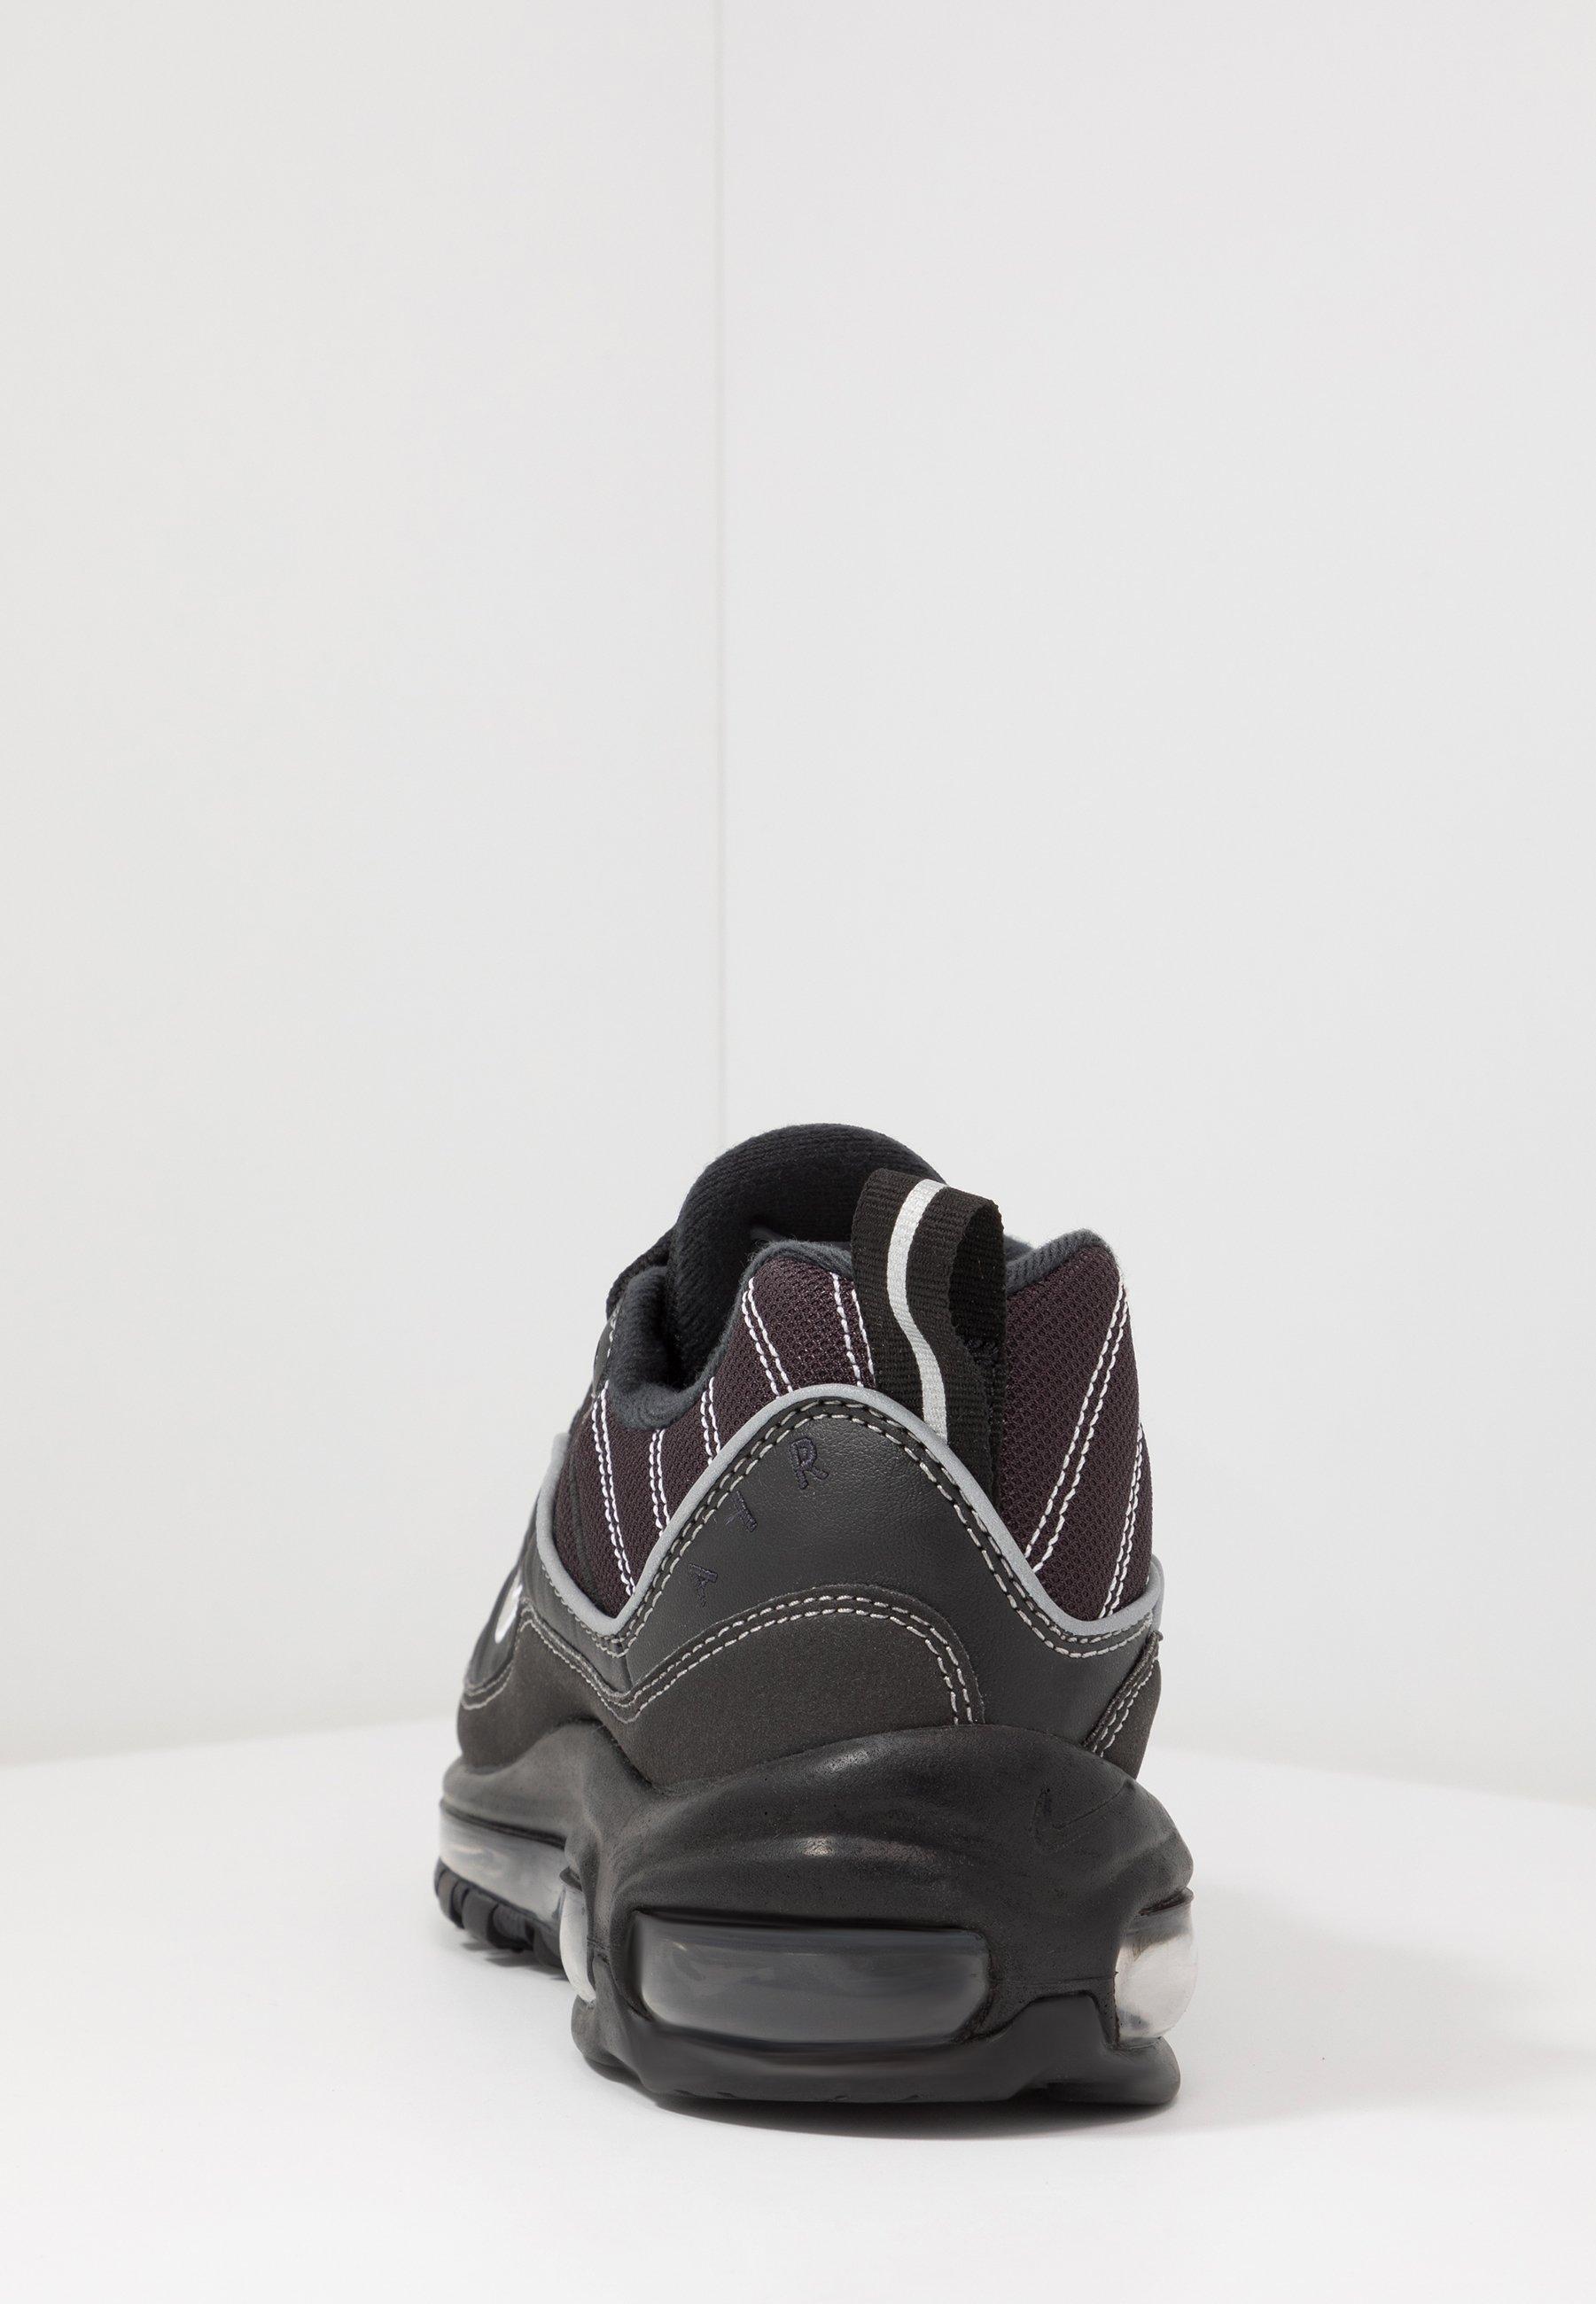 AIR MAX 98 Baskets basses blackmetallic silveroil greyvast greywhite